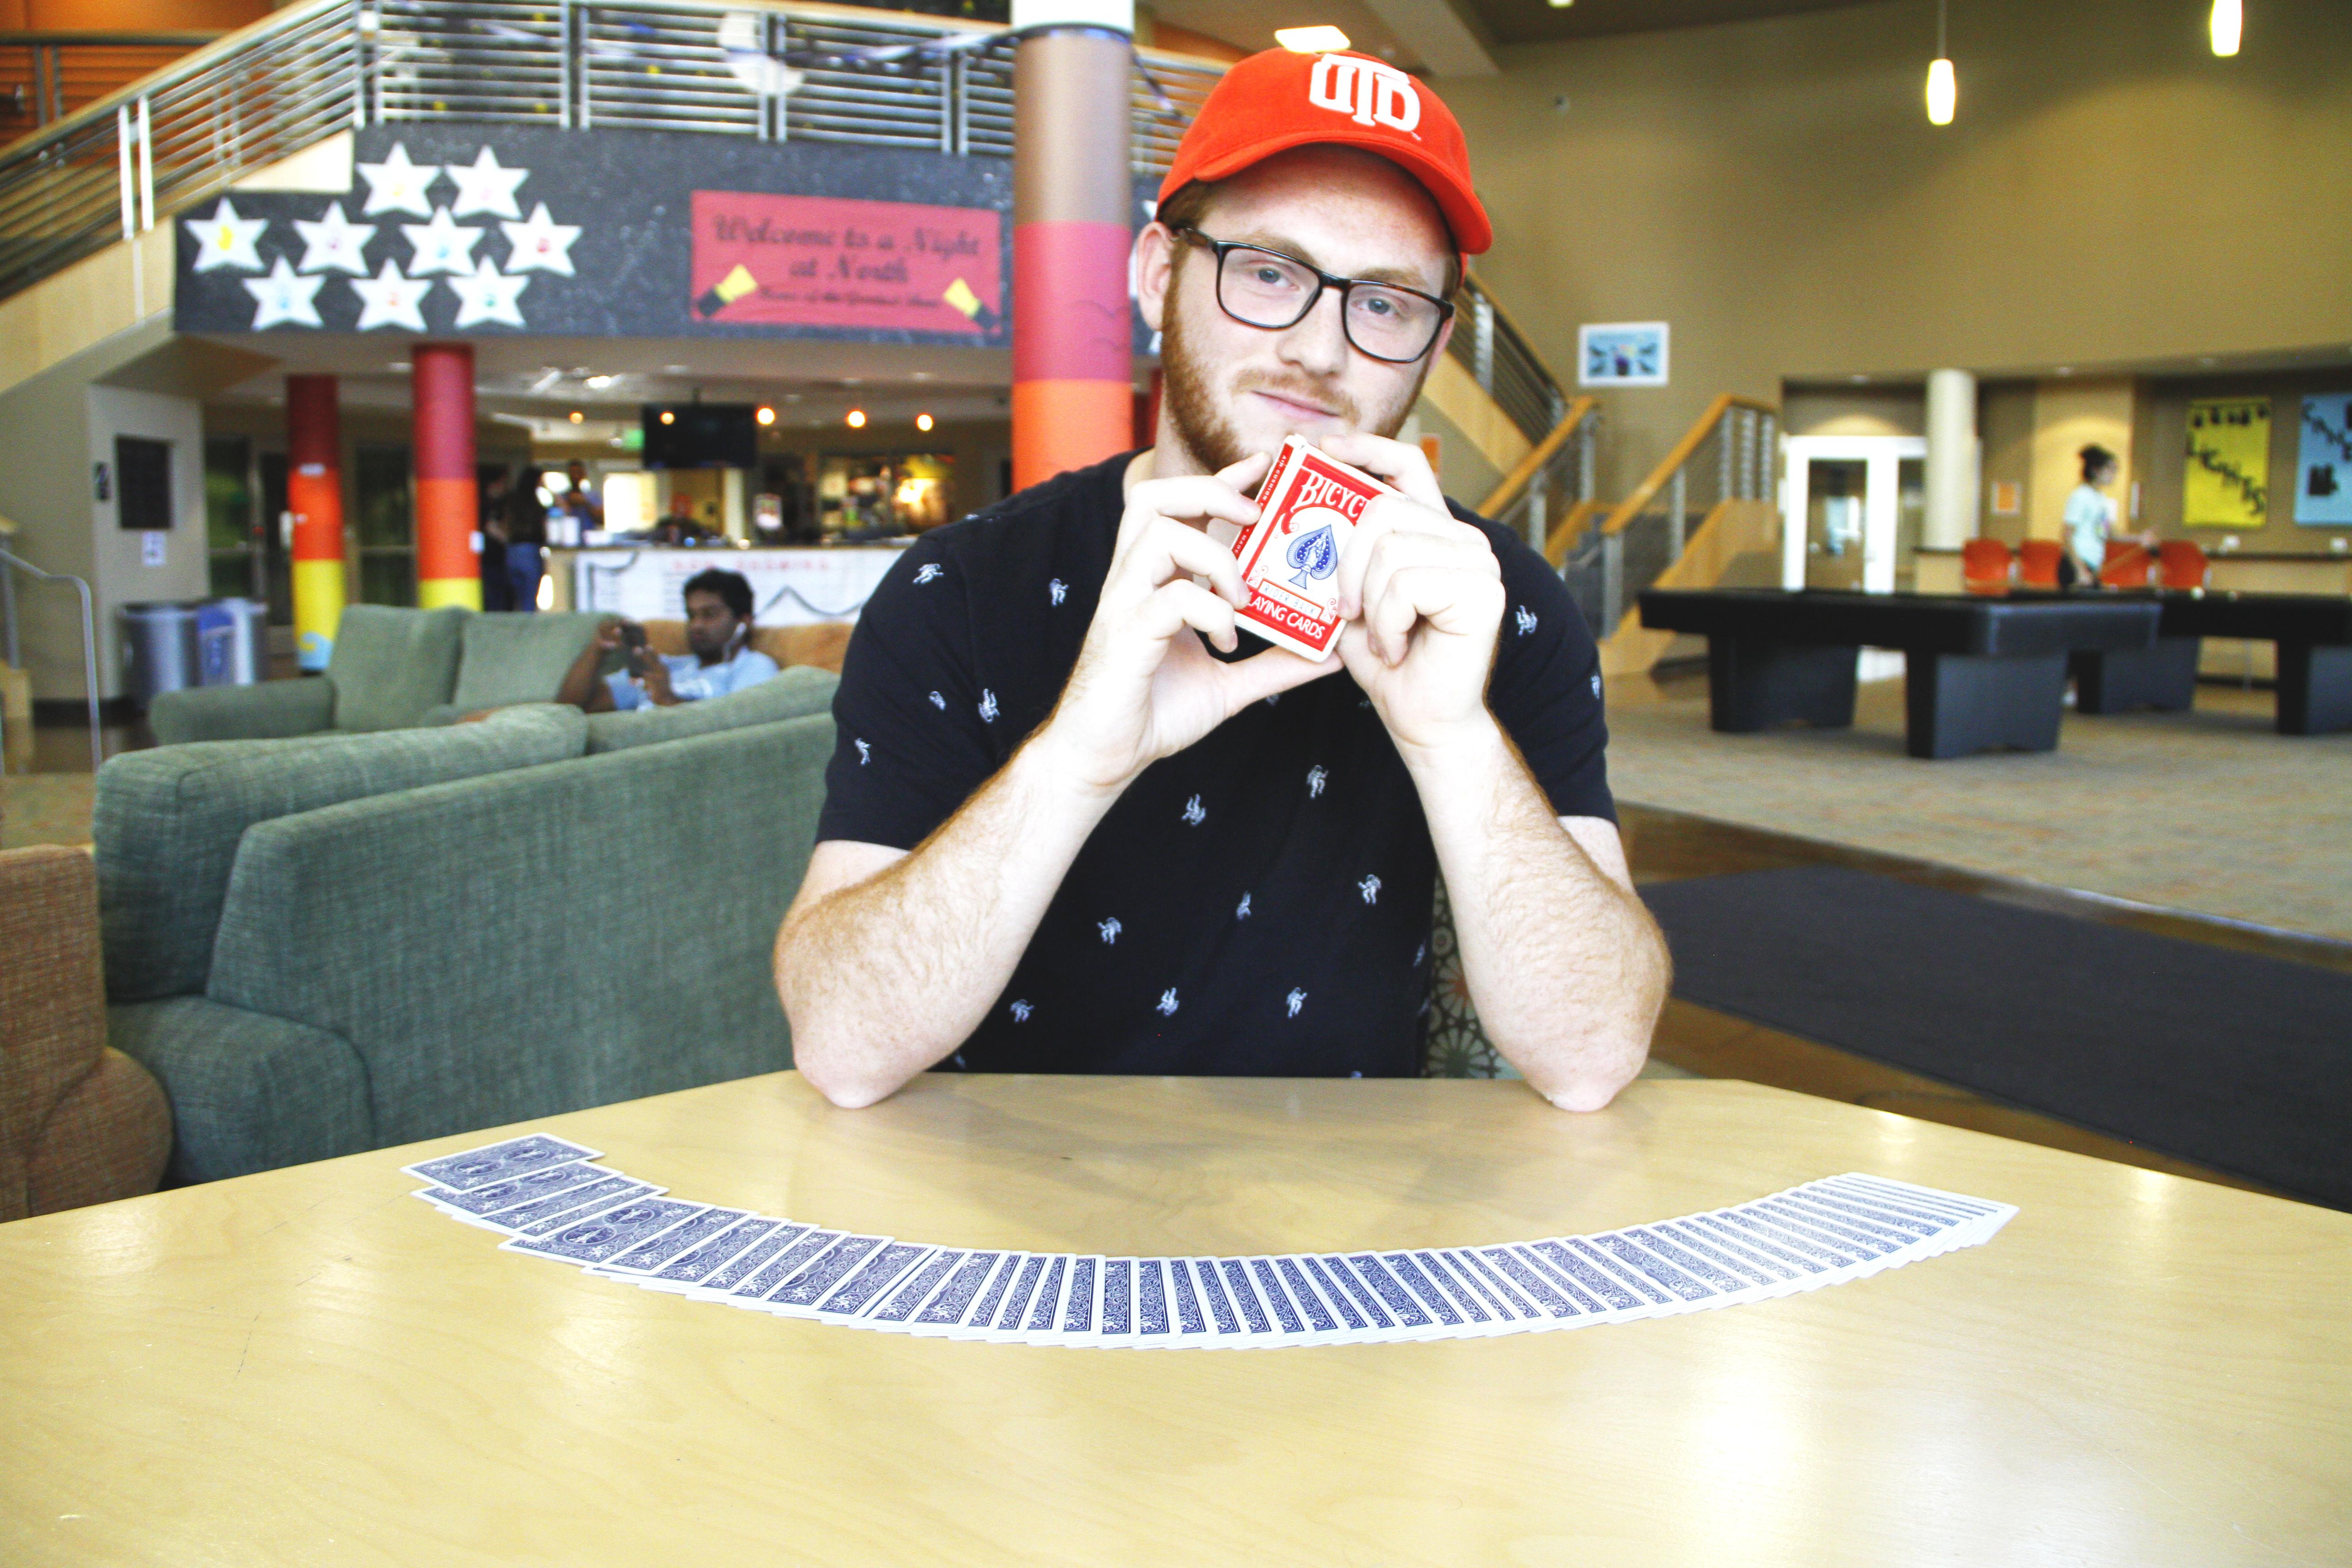 Freshman Magician Brings Tips, Tricks to New Club